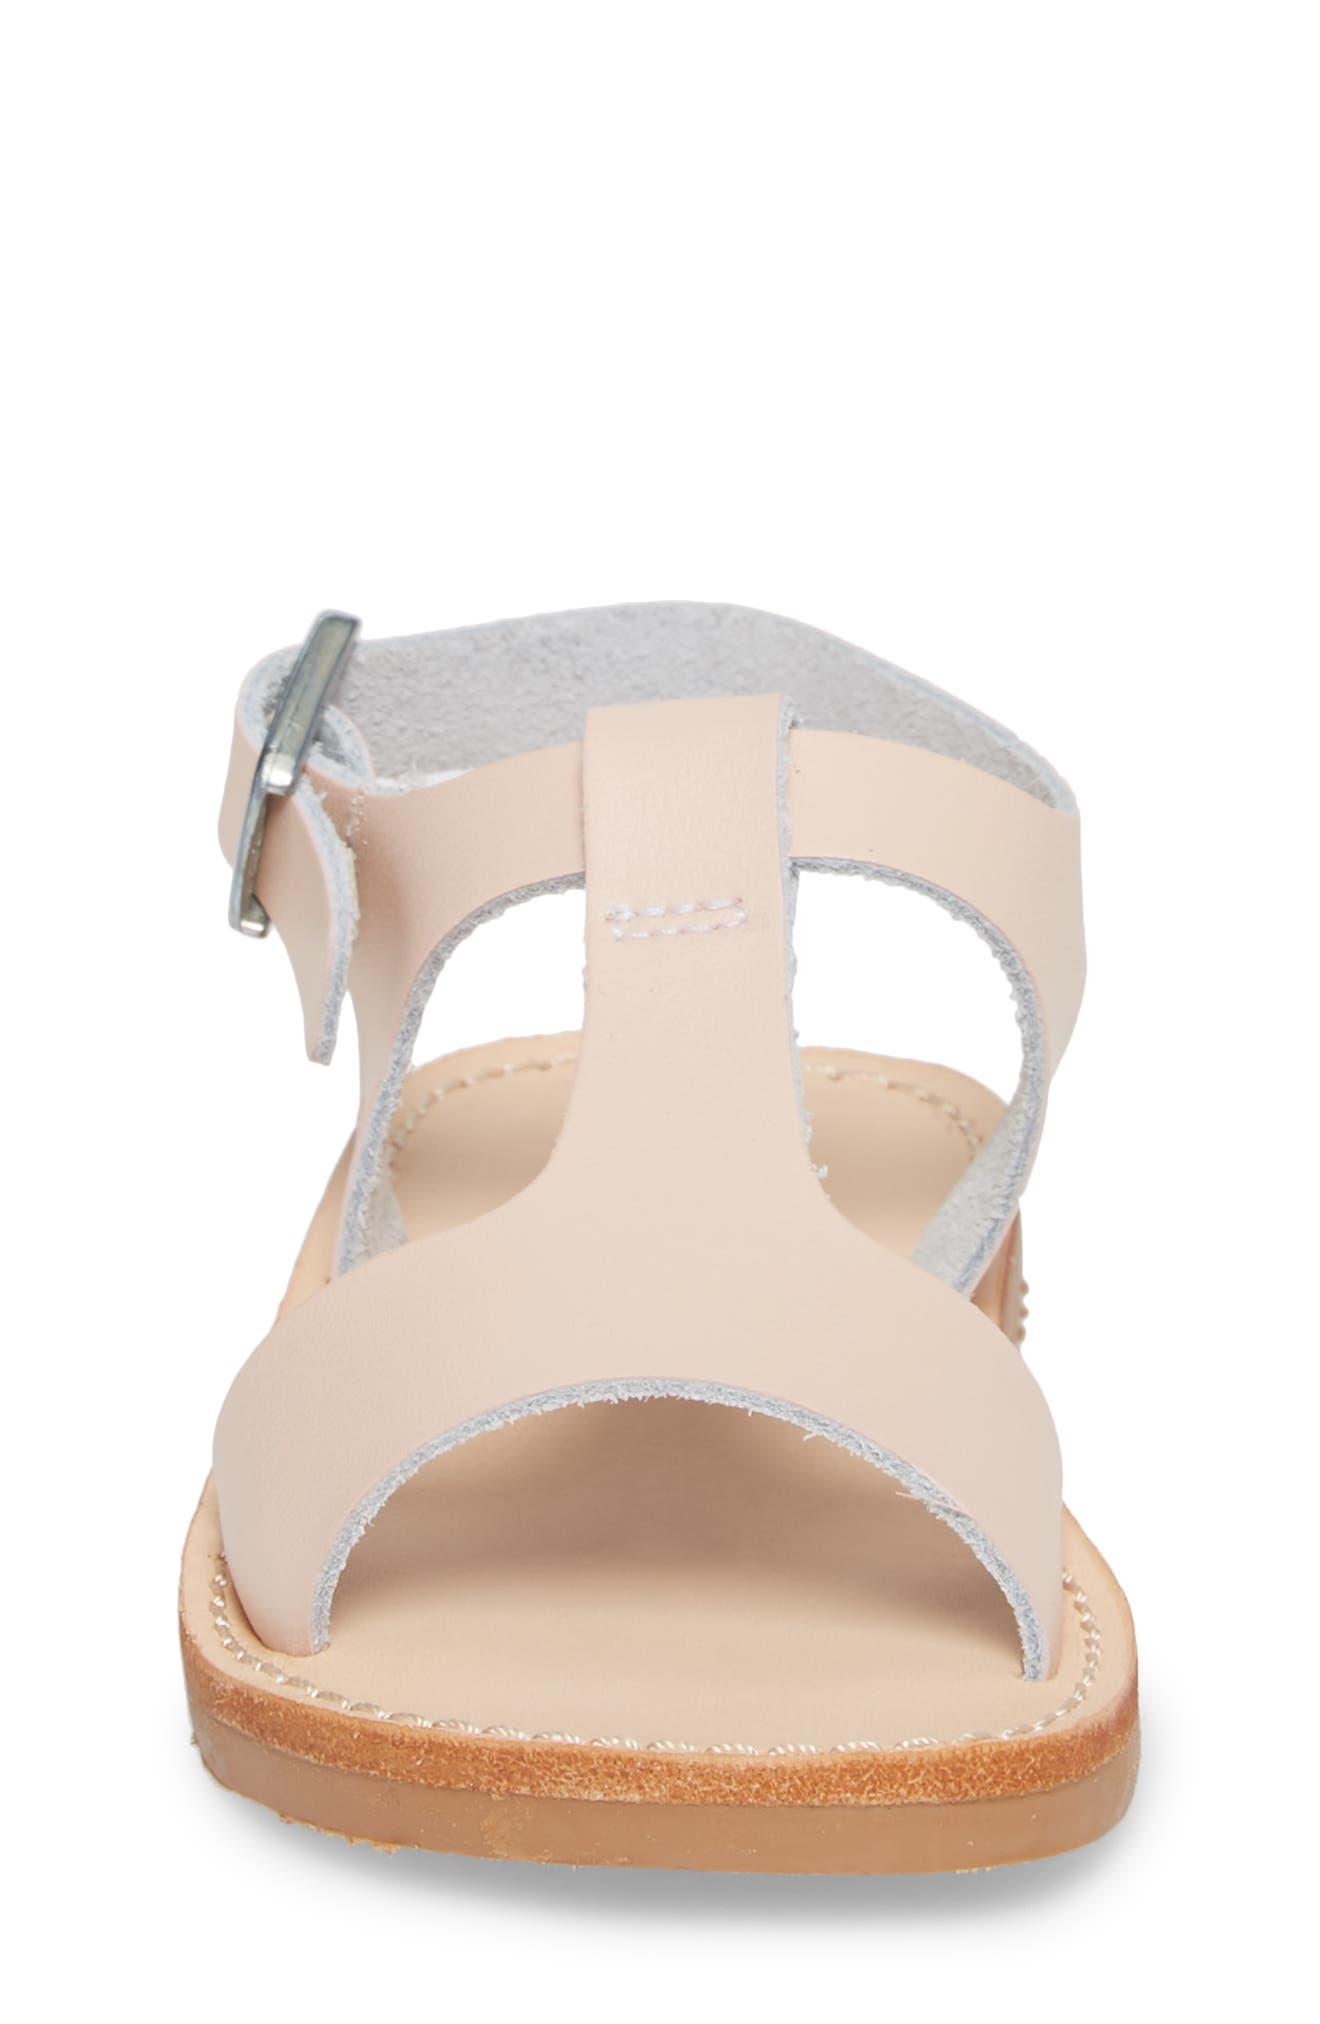 Malibu Water Resistant Sandal,                             Alternate thumbnail 4, color,                             Blush